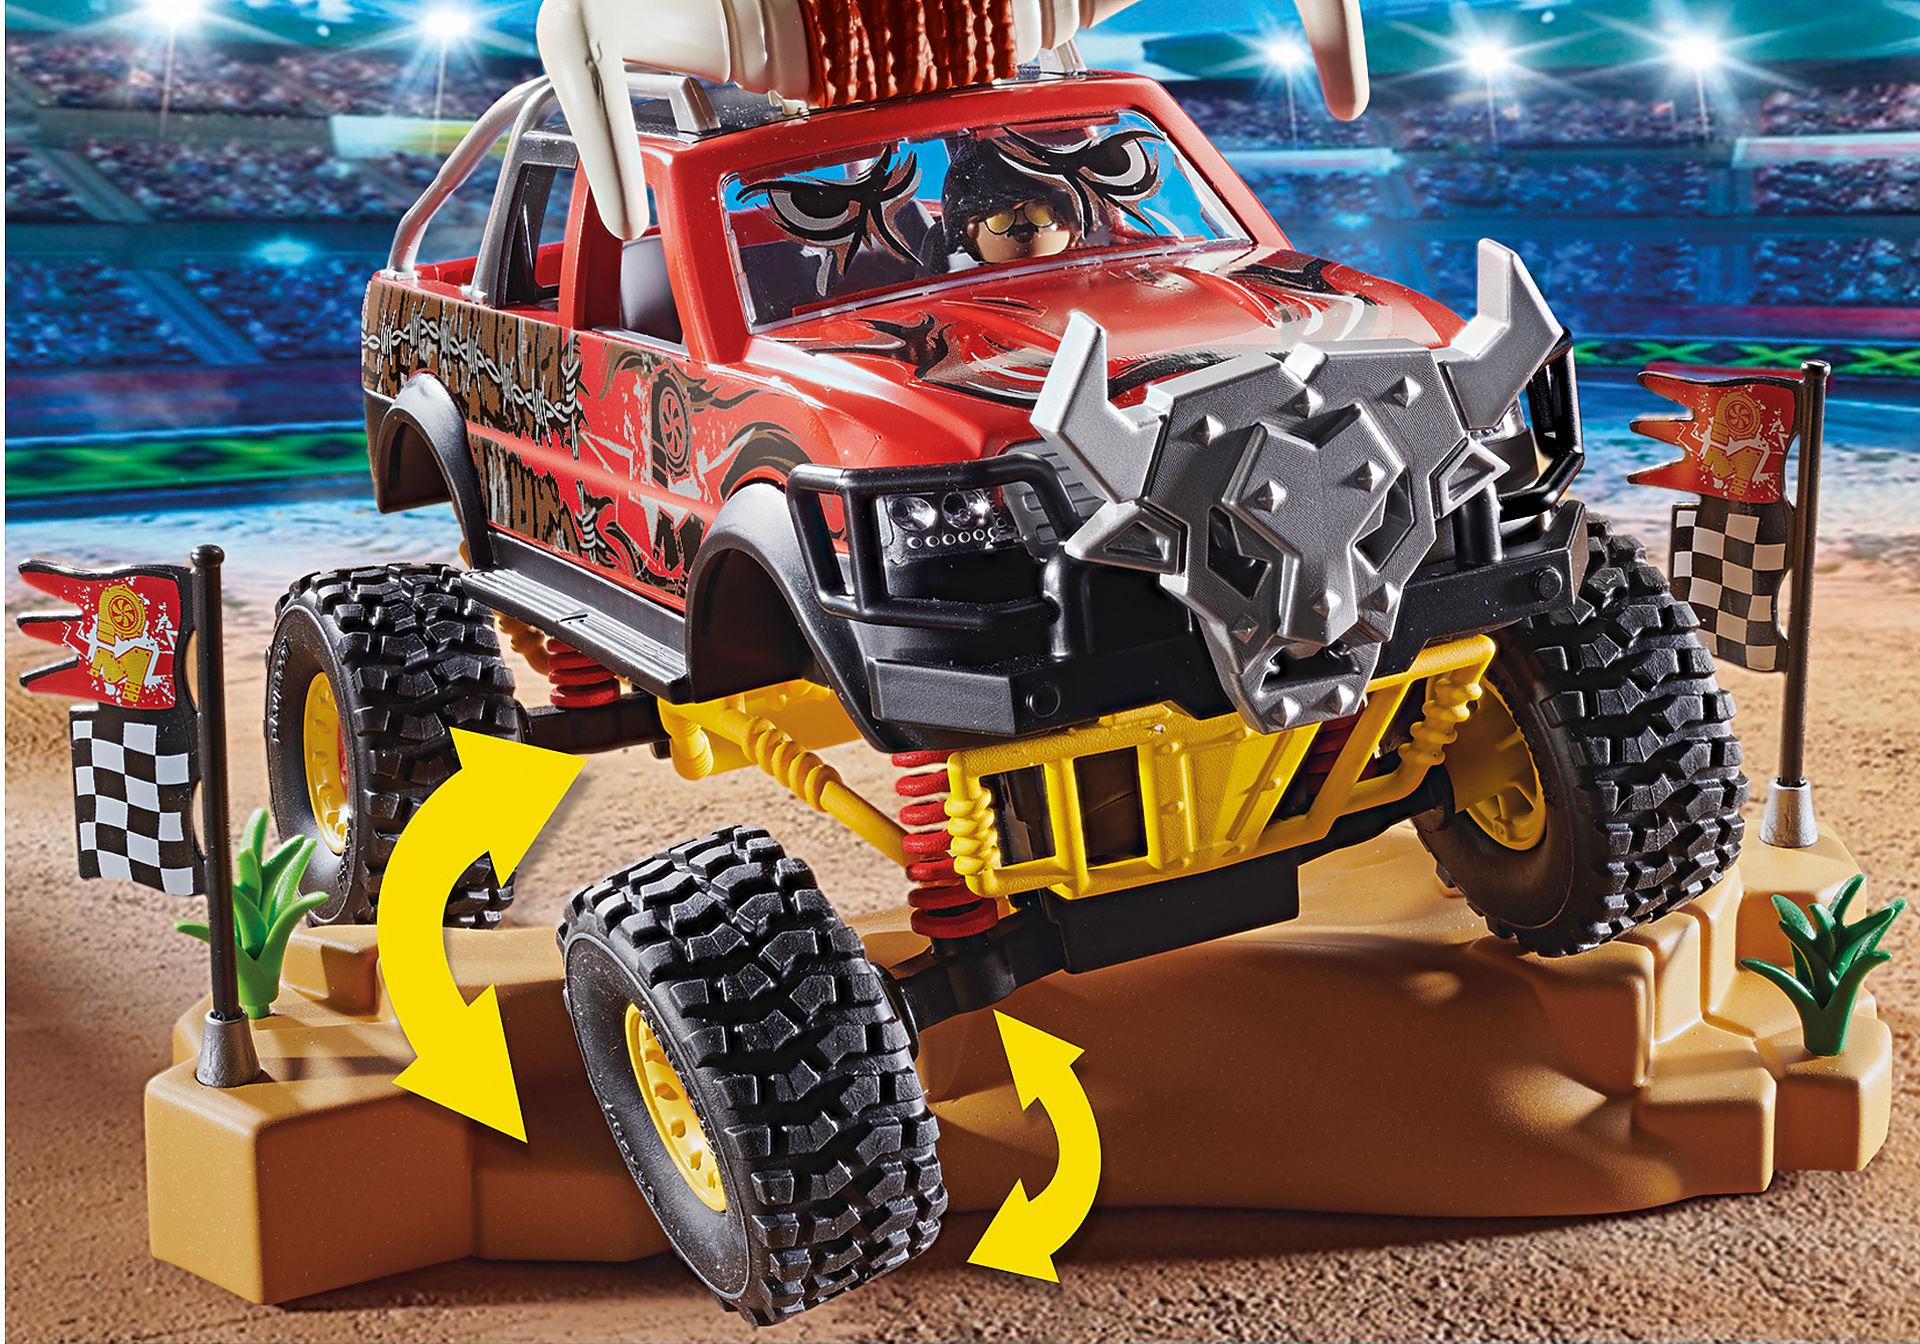 70549 Monster Truck Bika zoom image4